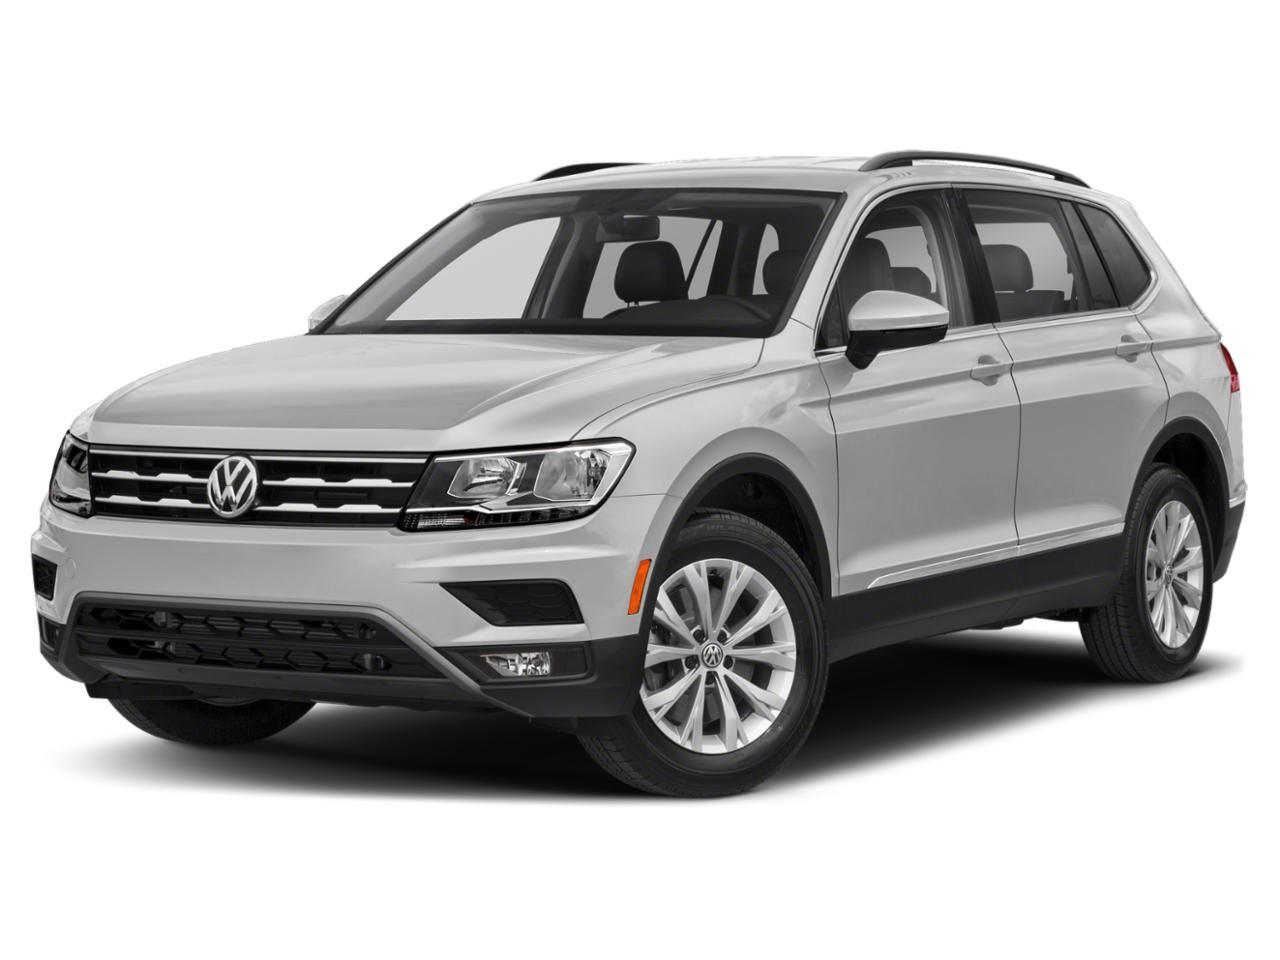 2018 Volkswagen Tiguan Vehicle Photo in Tucson, AZ 85712